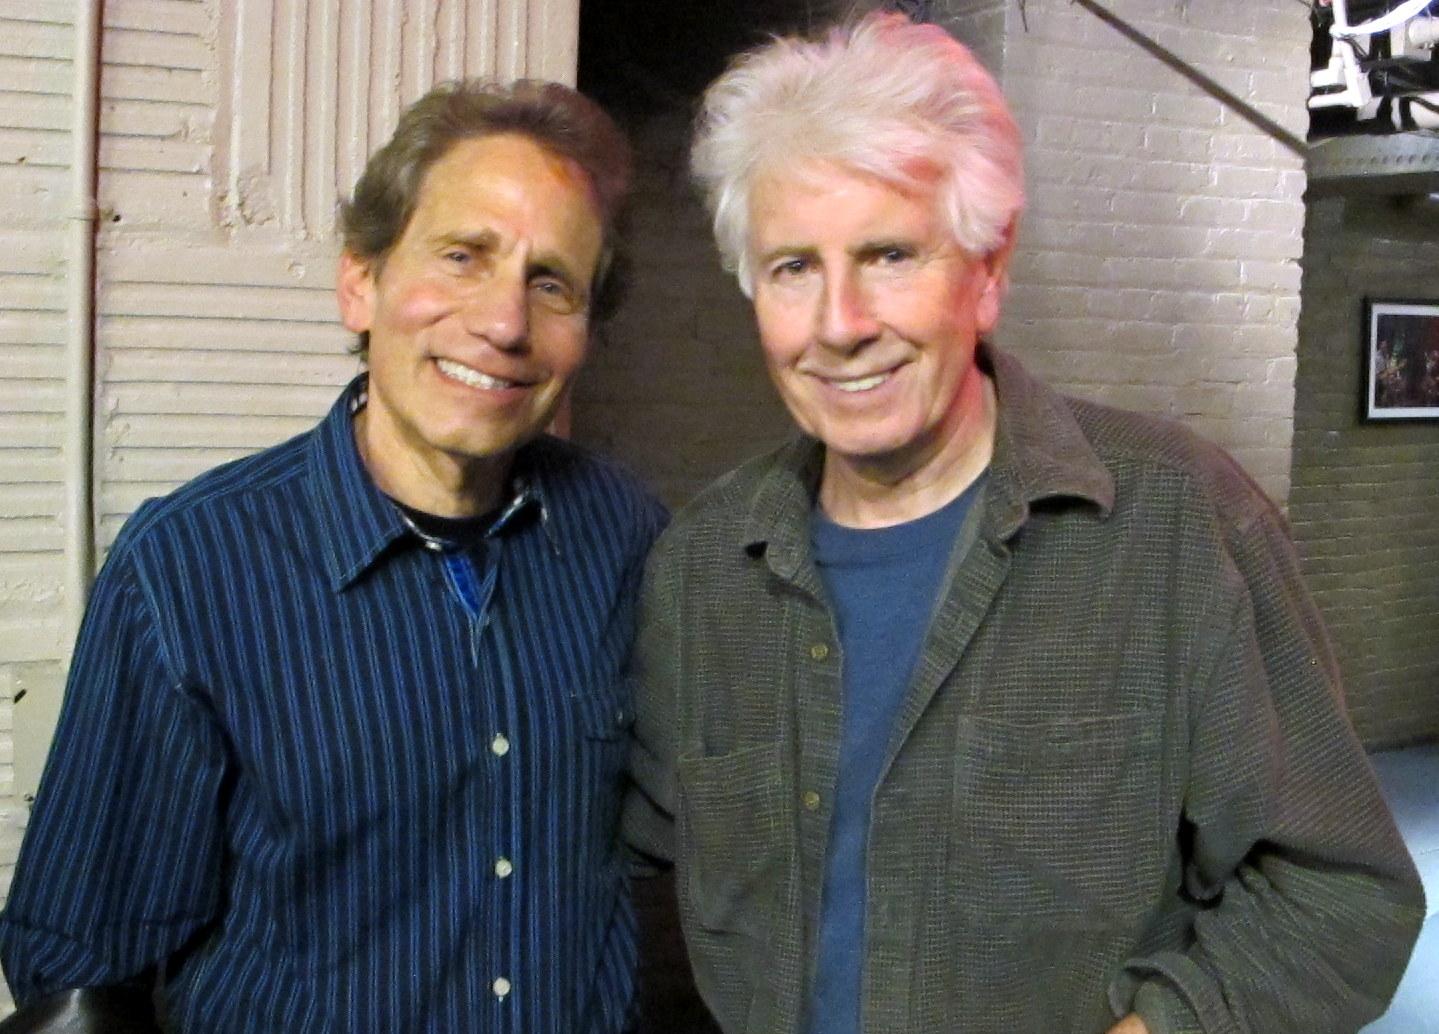 Nash & Elsas at the WFUV-FM studios/Photo courtesy of Dennis Elsas